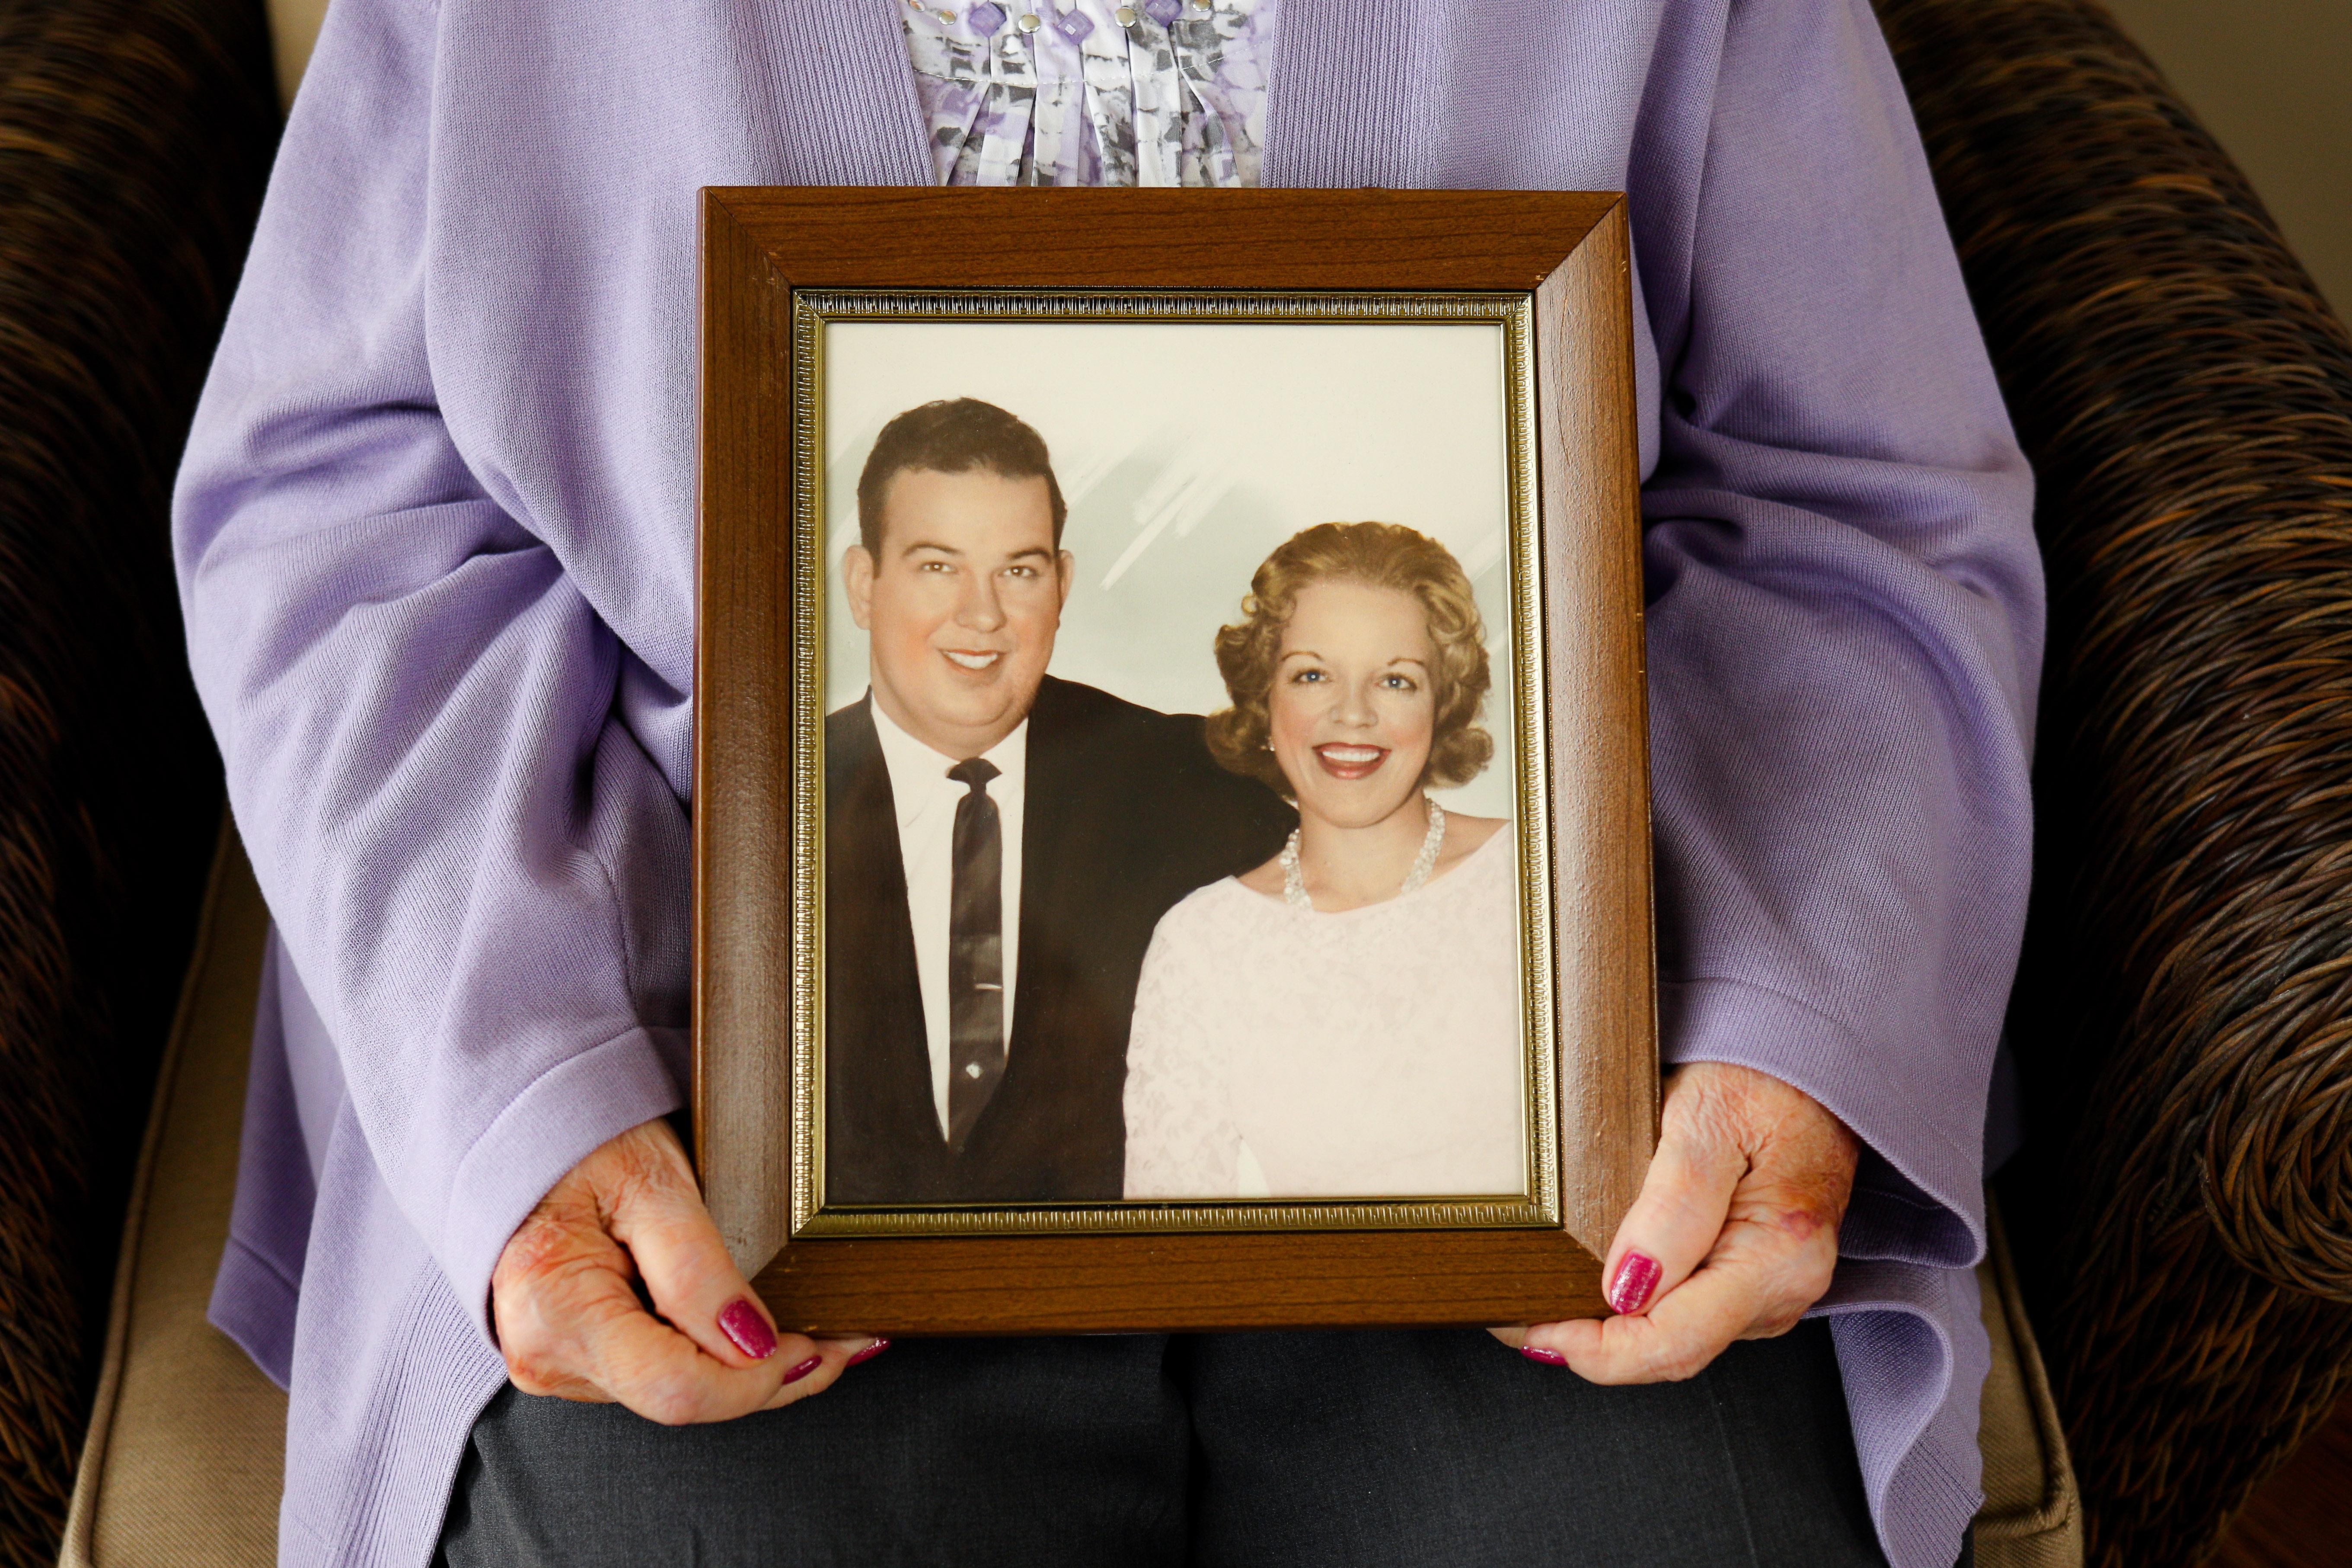 beccihethcoatphotography-family photographer-wheaton-18